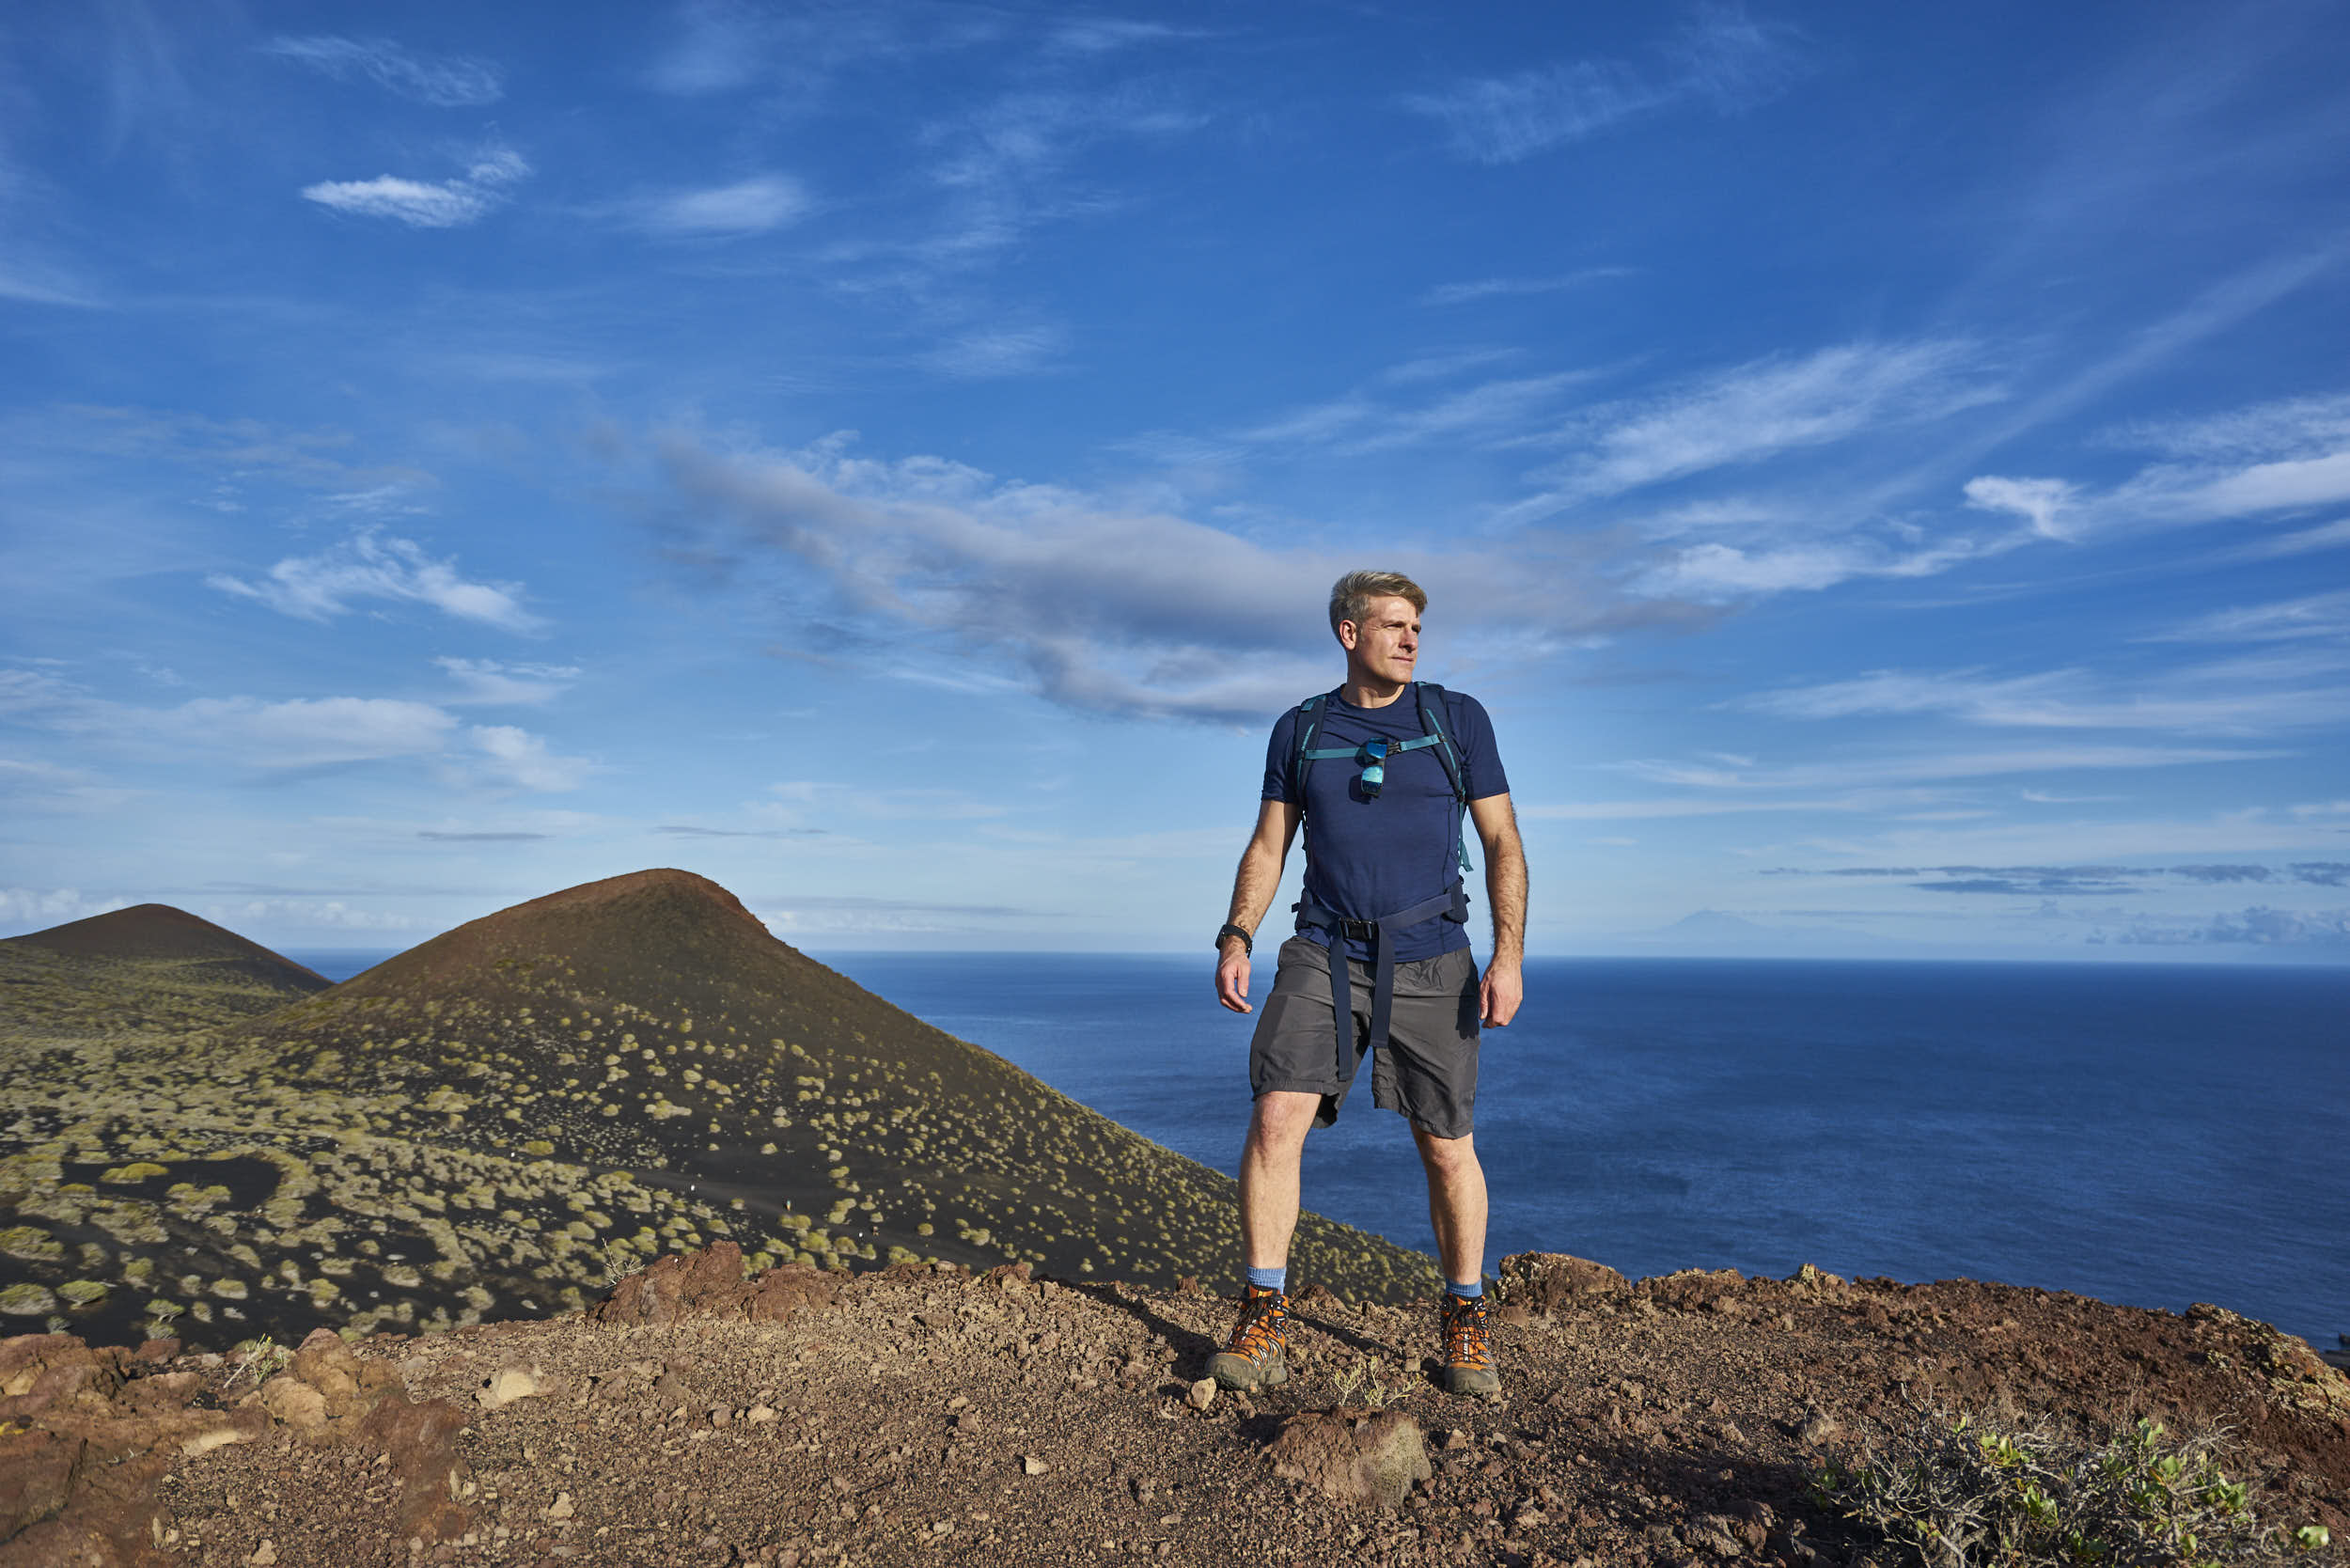 Matt Ray adventure writer and photographer trekking on La Palma